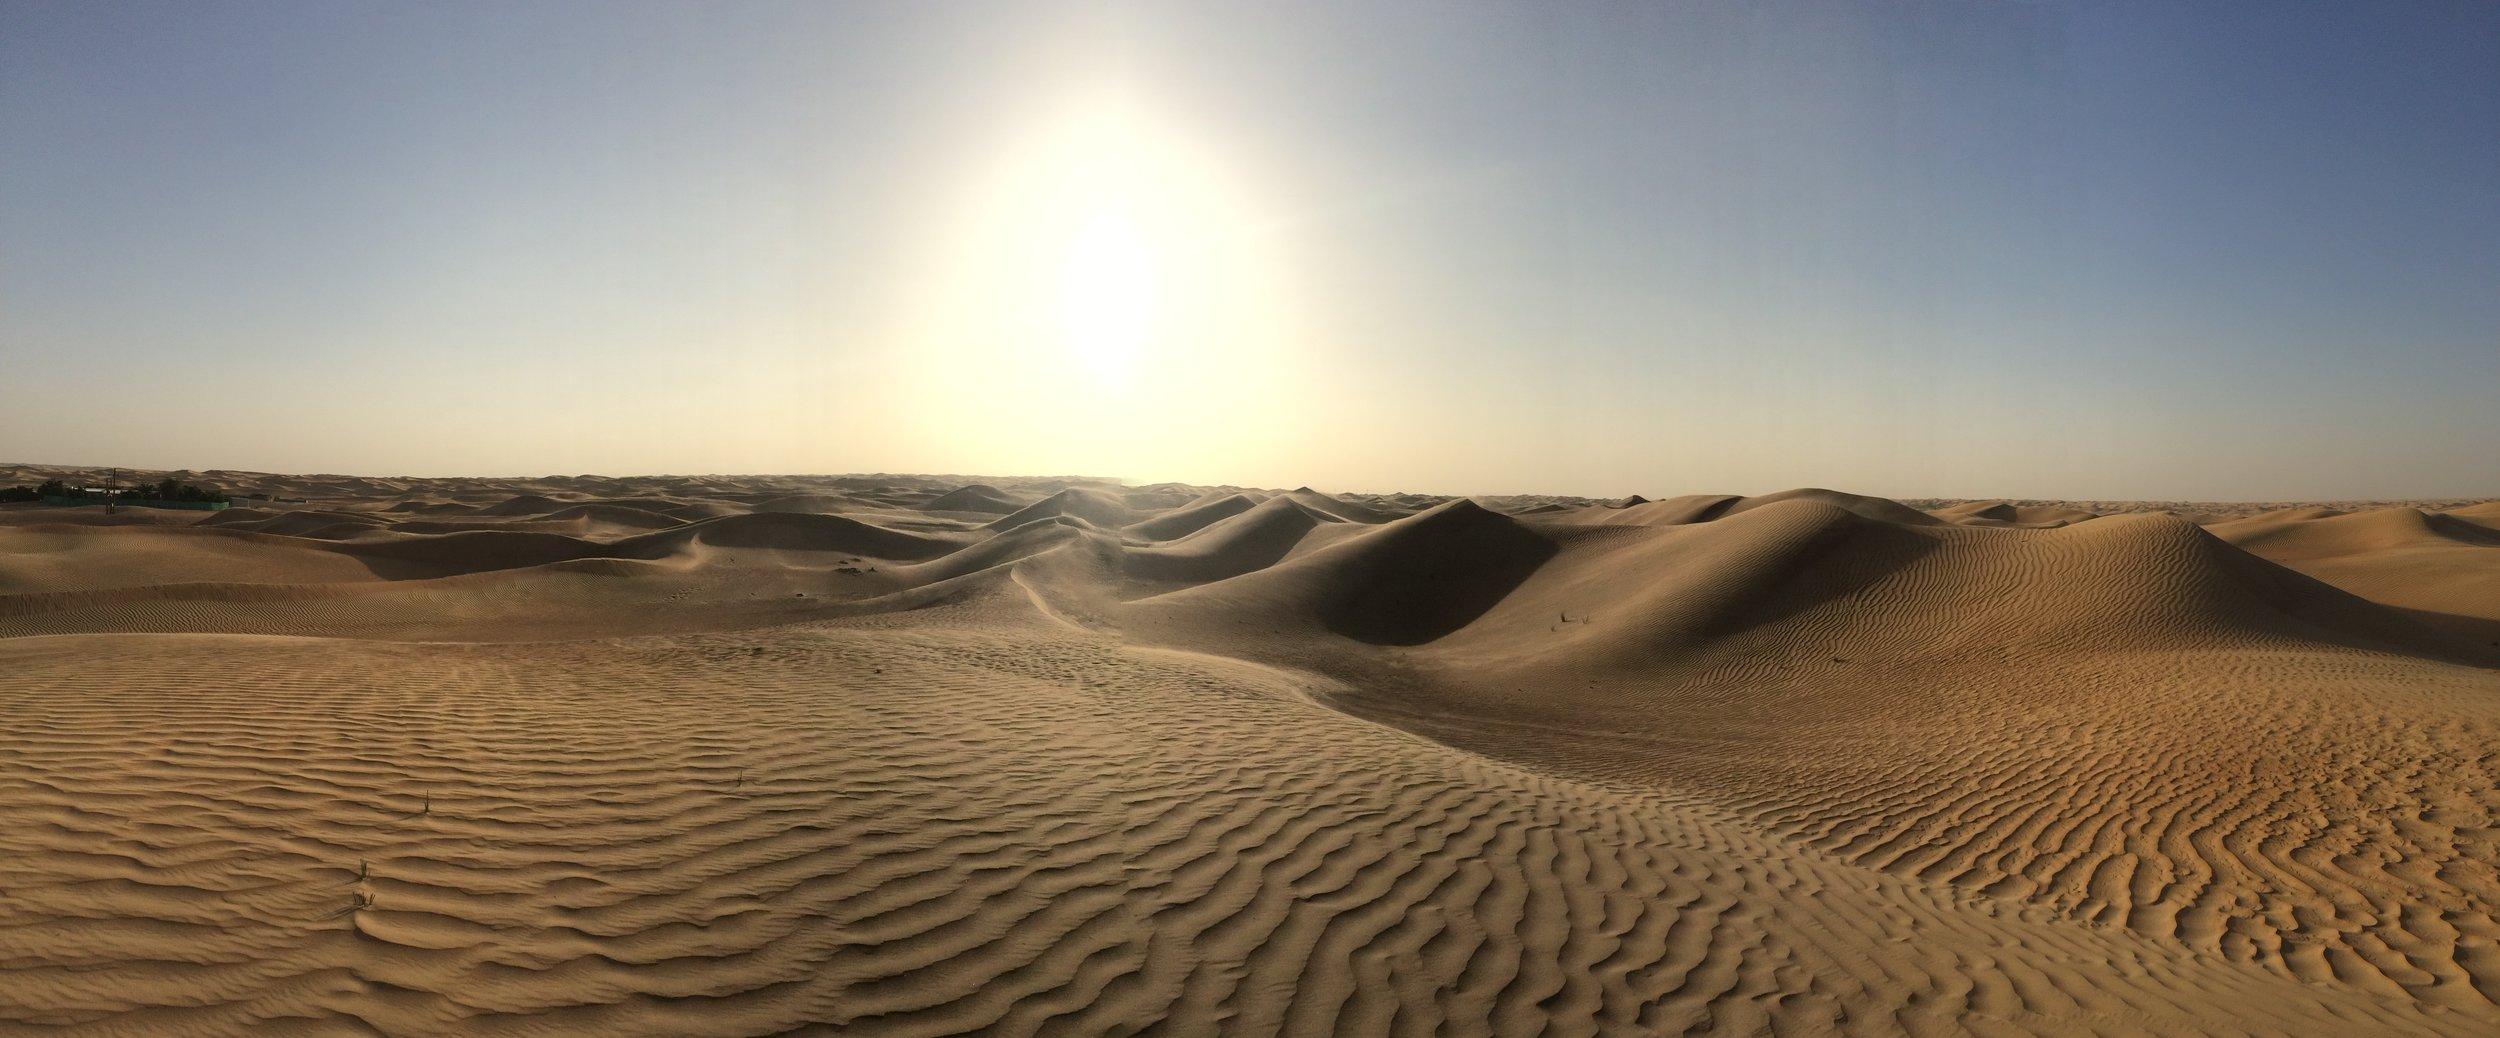 Dubai Dunes - 20.JPG